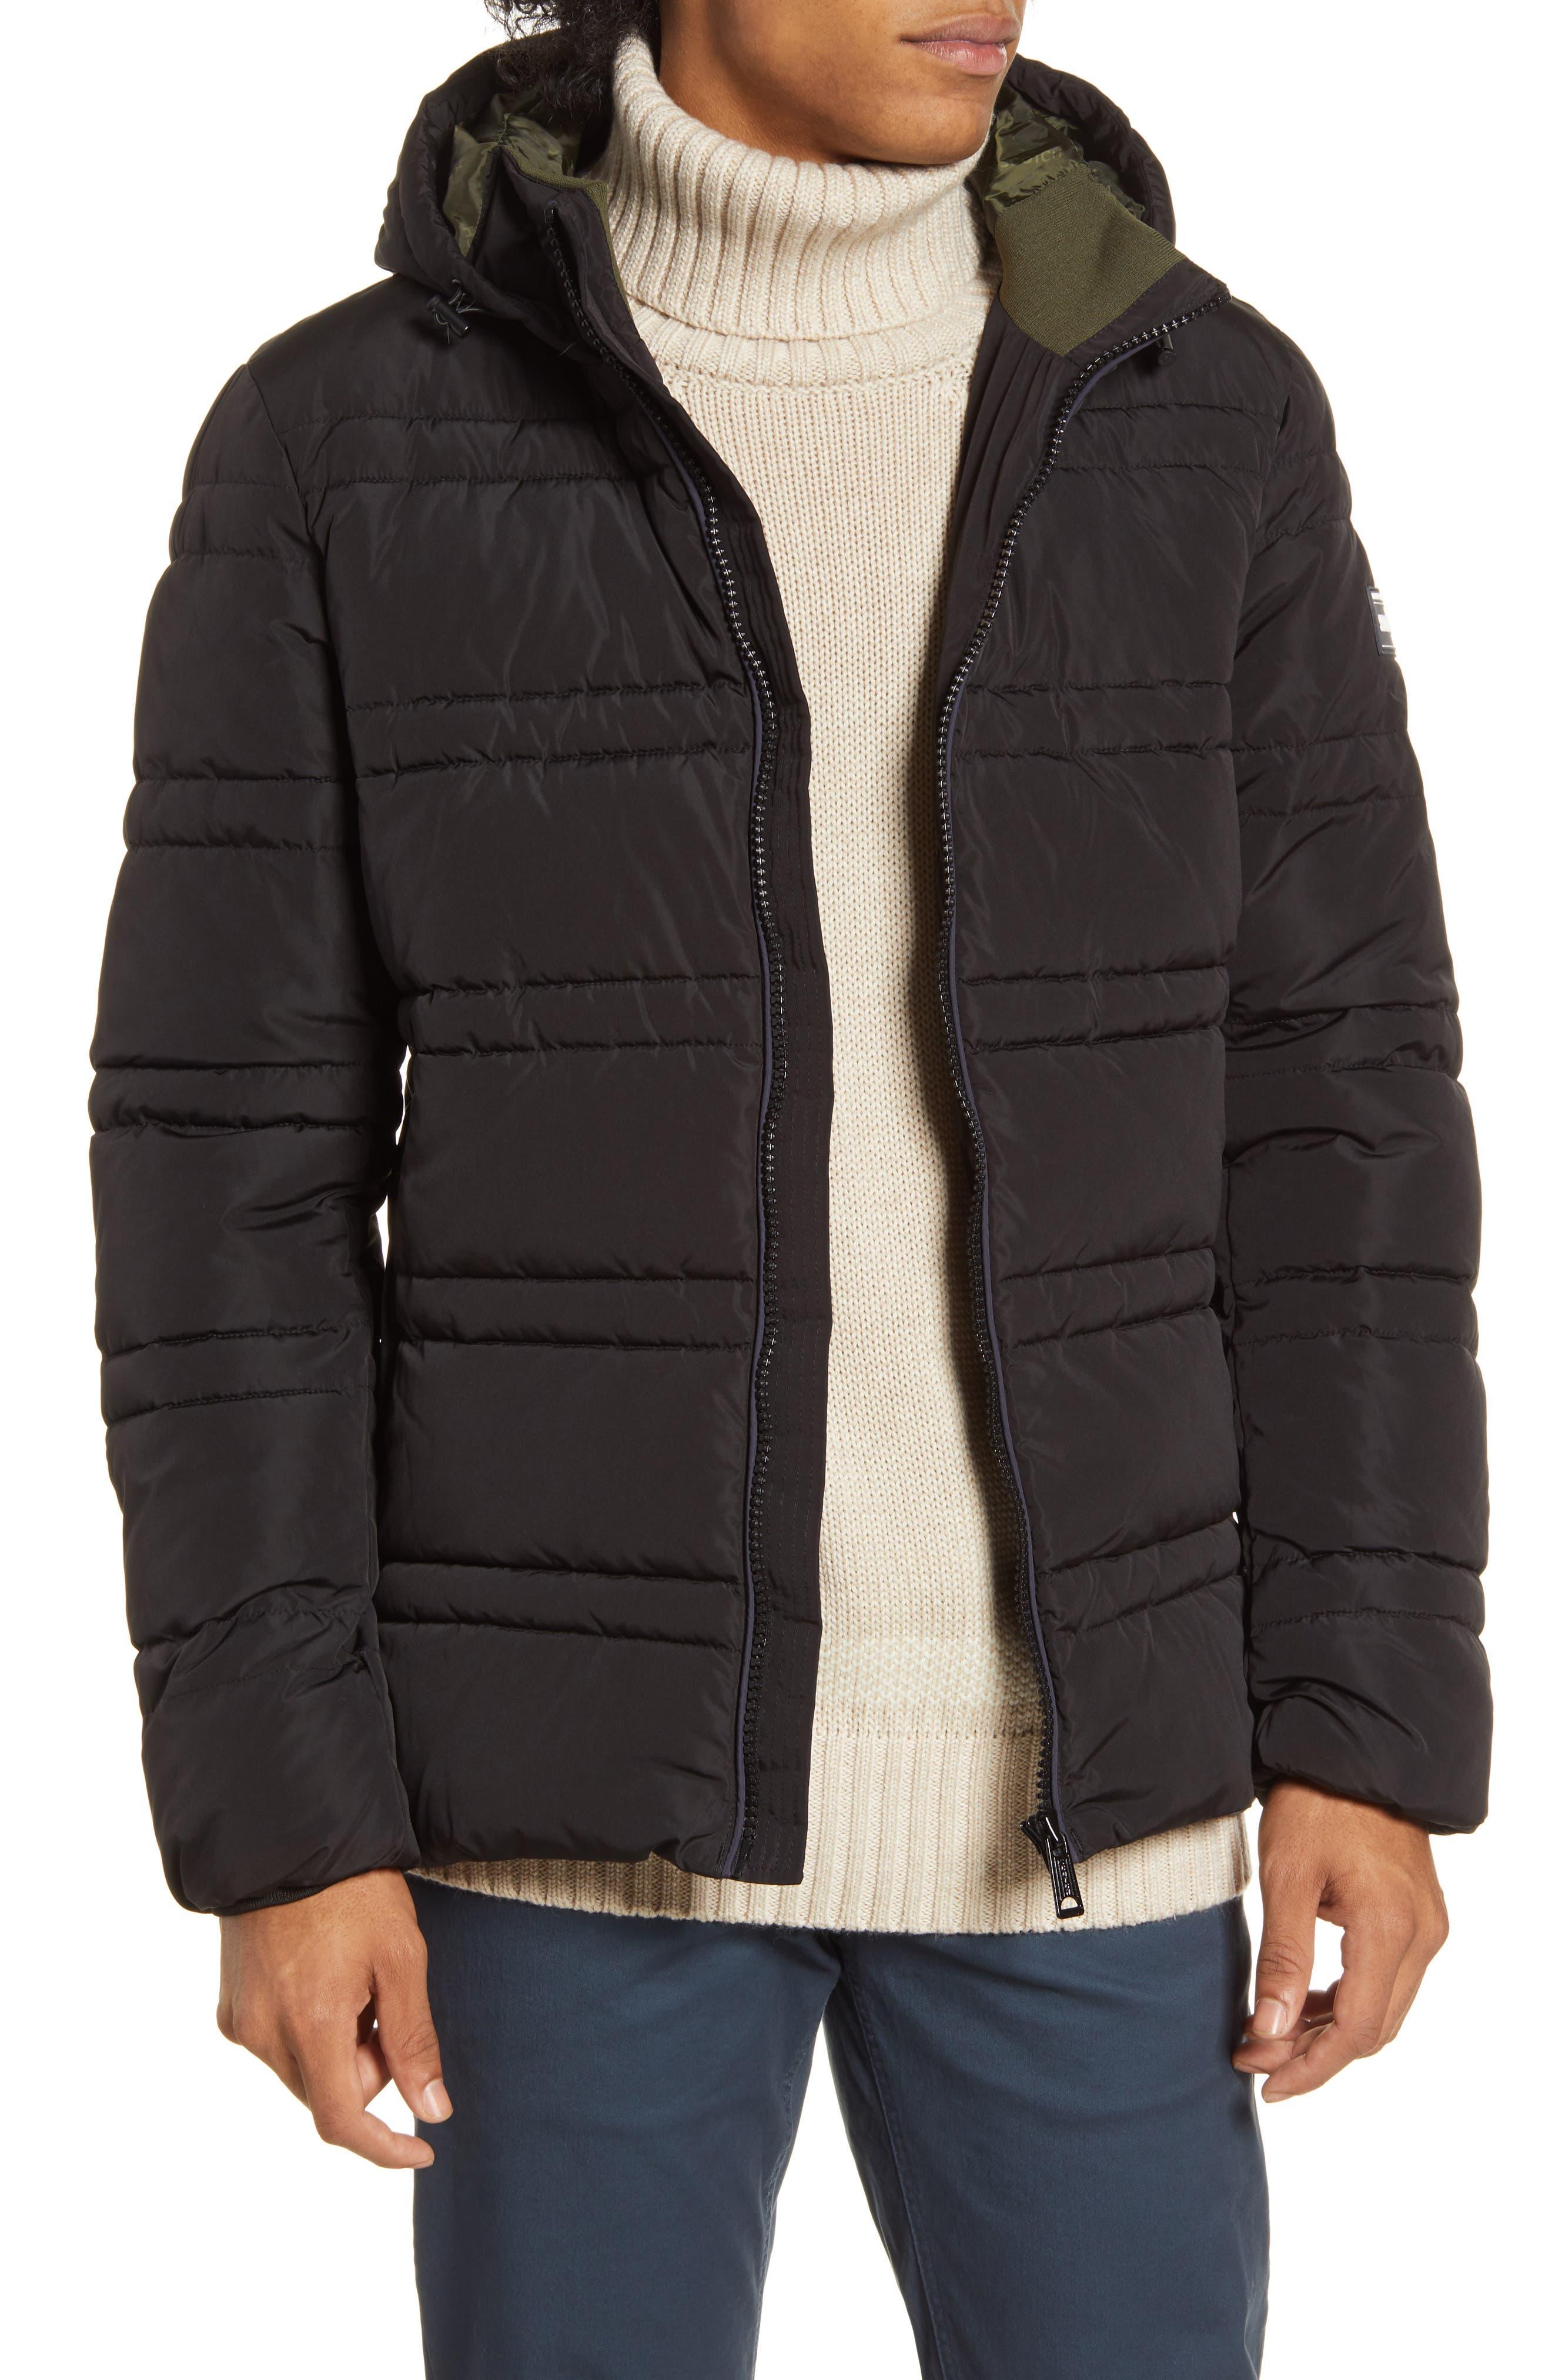 Image of Scotch & Soda Classic Hooded PrimaLoft Jacket